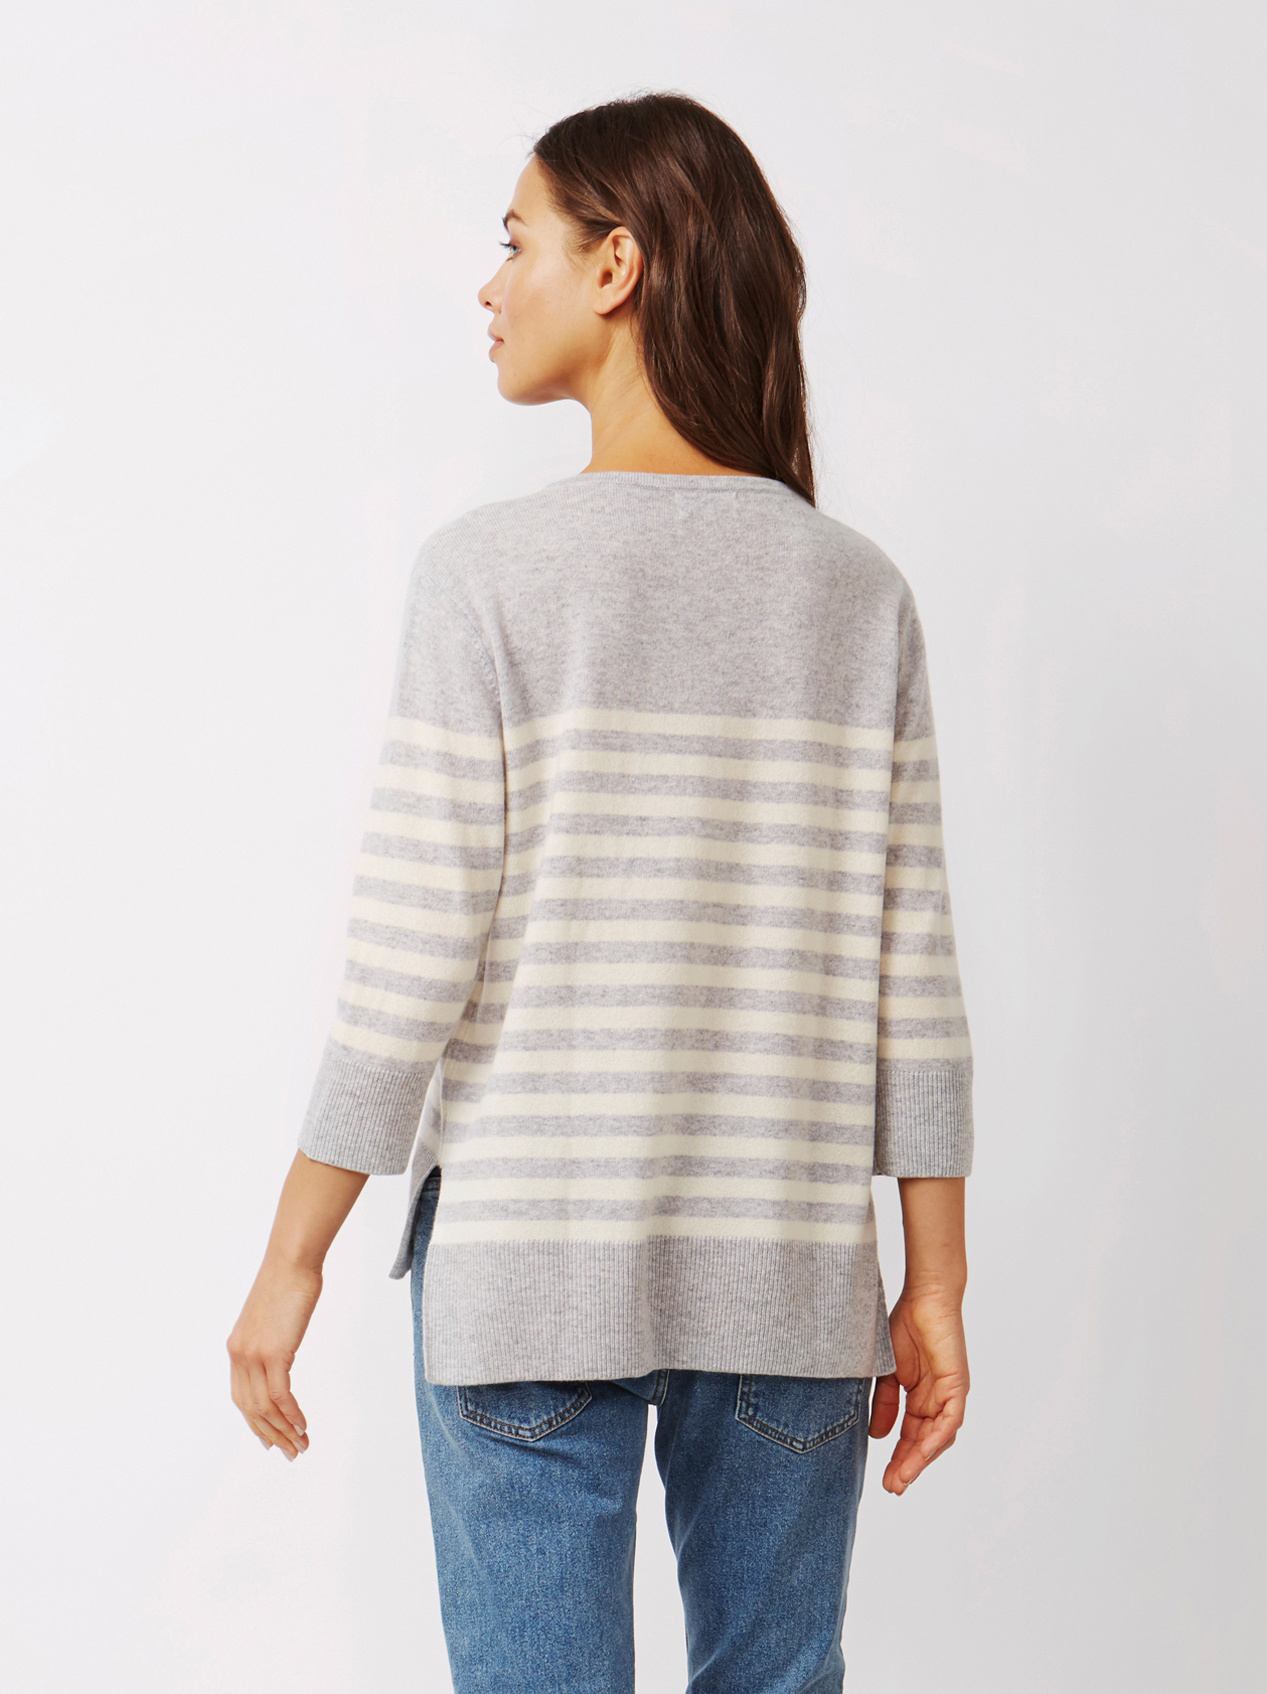 Soft Goat Women's Striped Sweater Light Grey